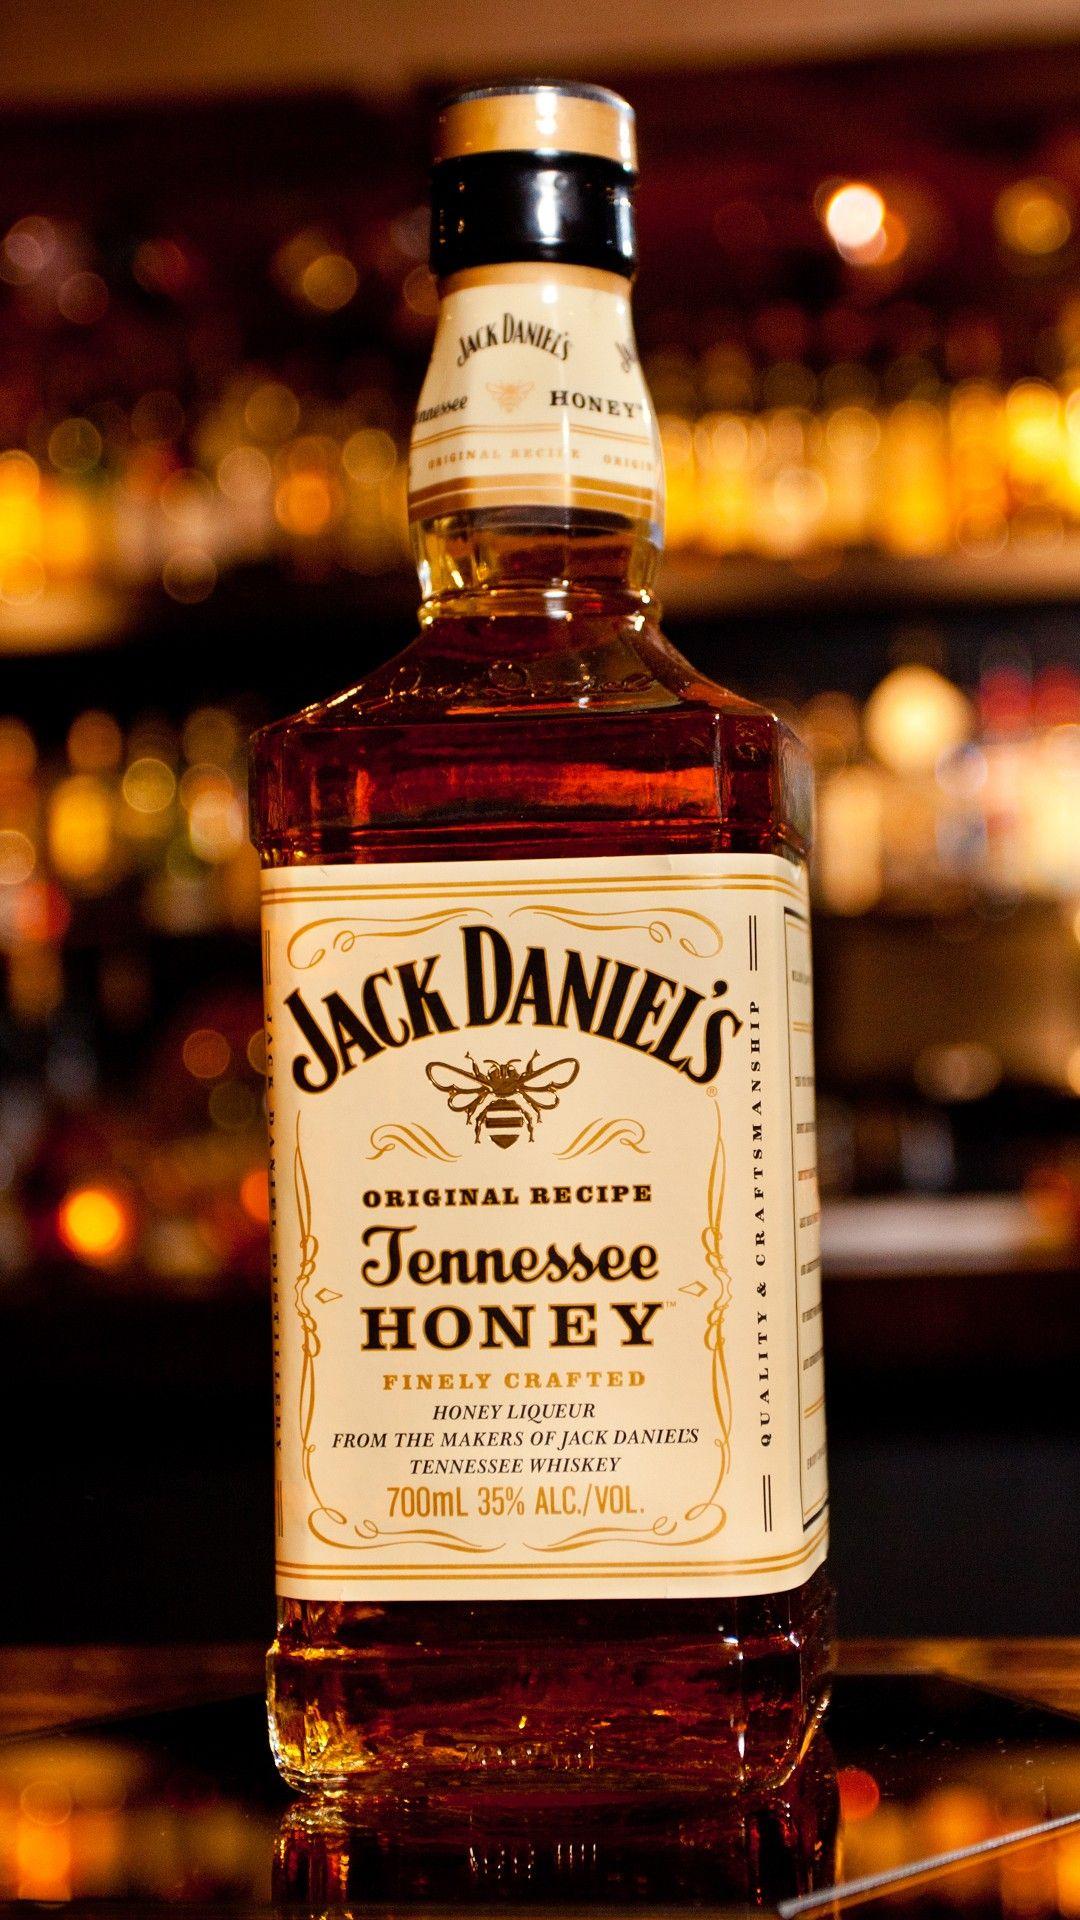 Jack Daniels Honey Whiskey Smartphone Wallpaper Hd Jack Daniels